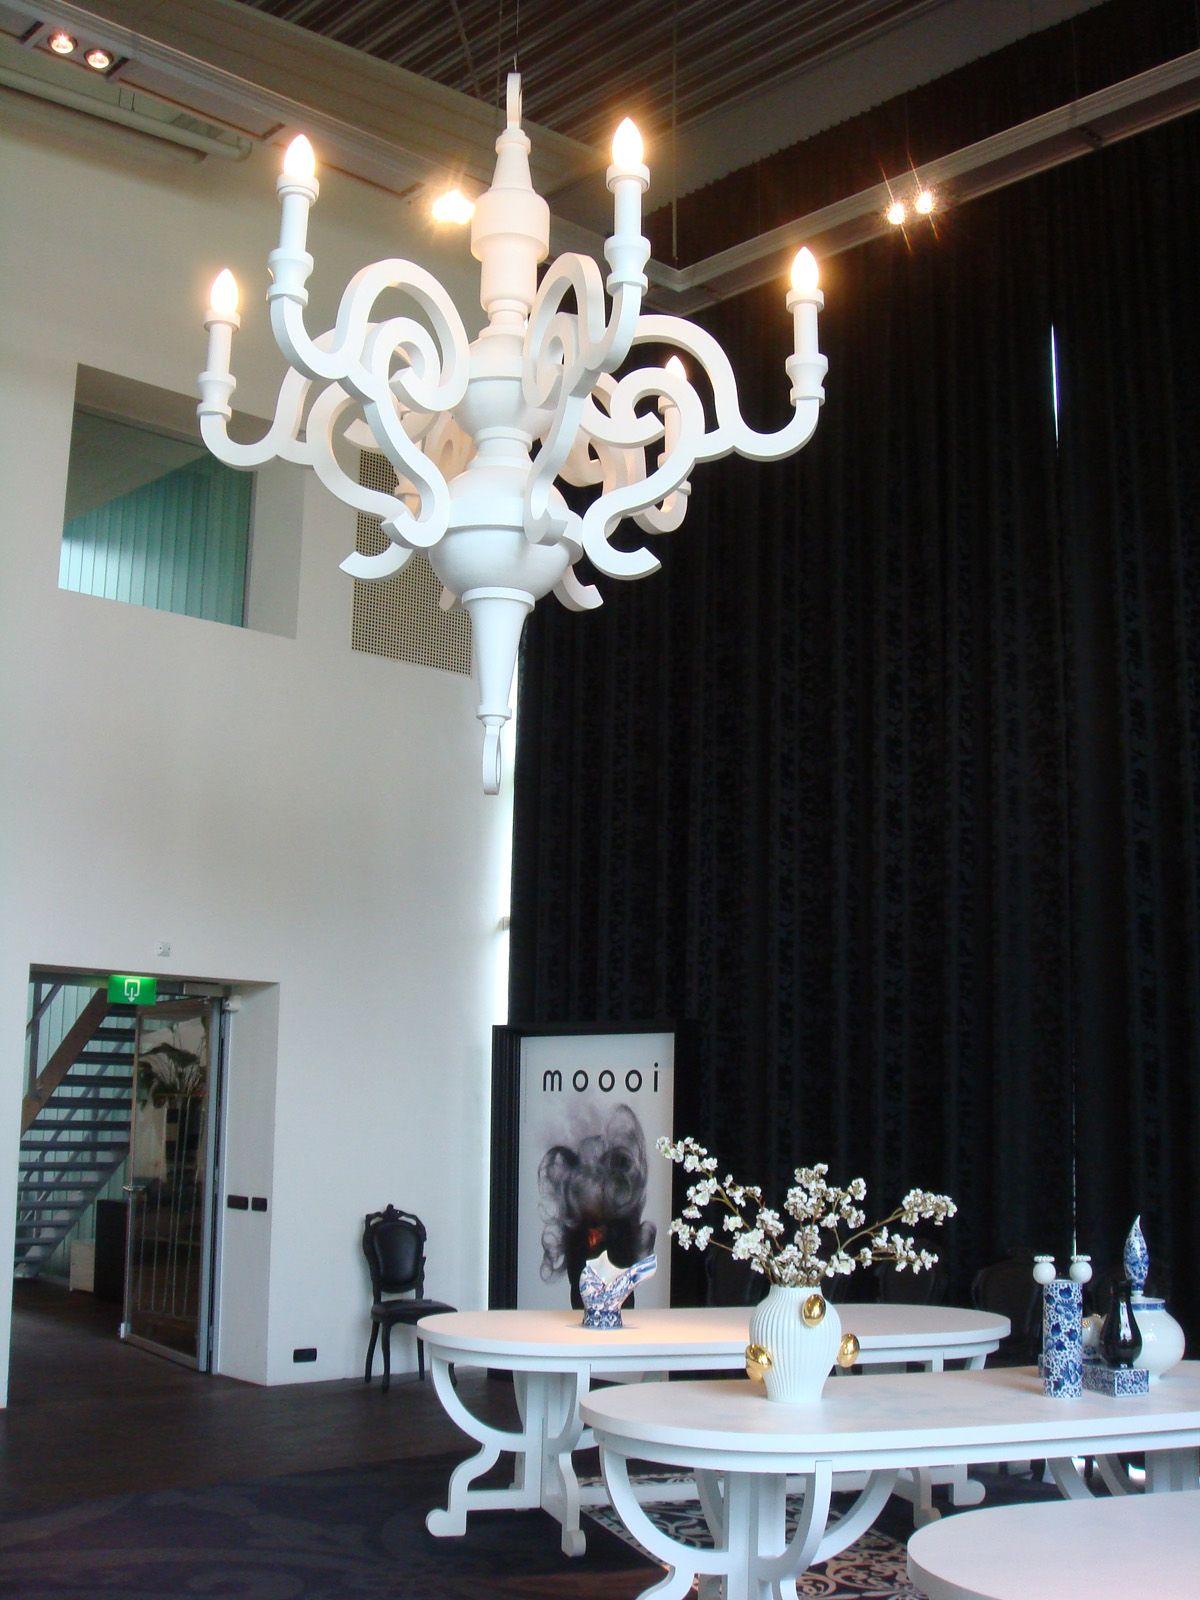 Moooi paper chandelier op mijn wishlist for the home pinterest moooi paper chandelier op mijn wishlist arubaitofo Choice Image